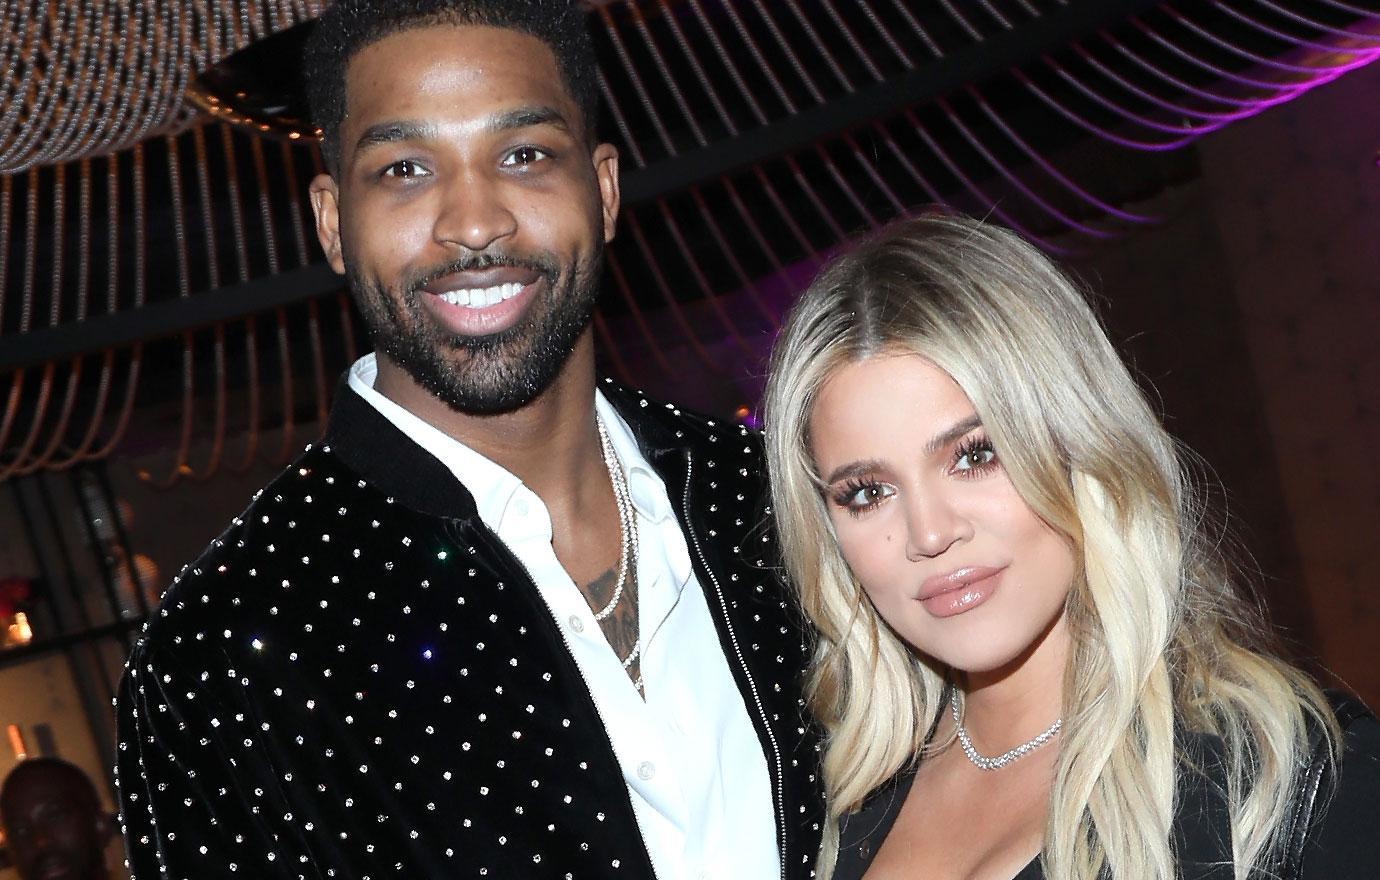 Khloe Kardashian Spends Thanksgiving With Cheating Tristan Thompson